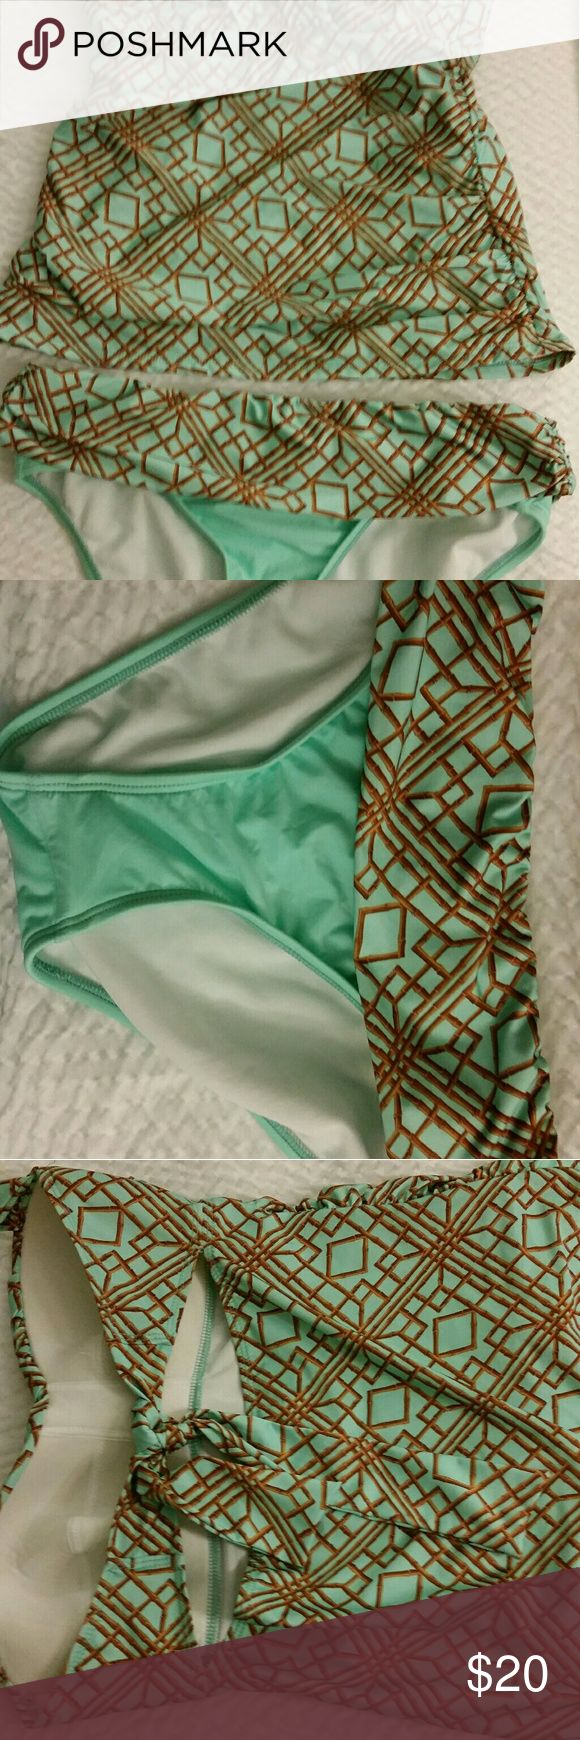 Tankini Mint/gold tankini new without tags, from a smoke free home ANTONIO MELANI Swim Bikinis